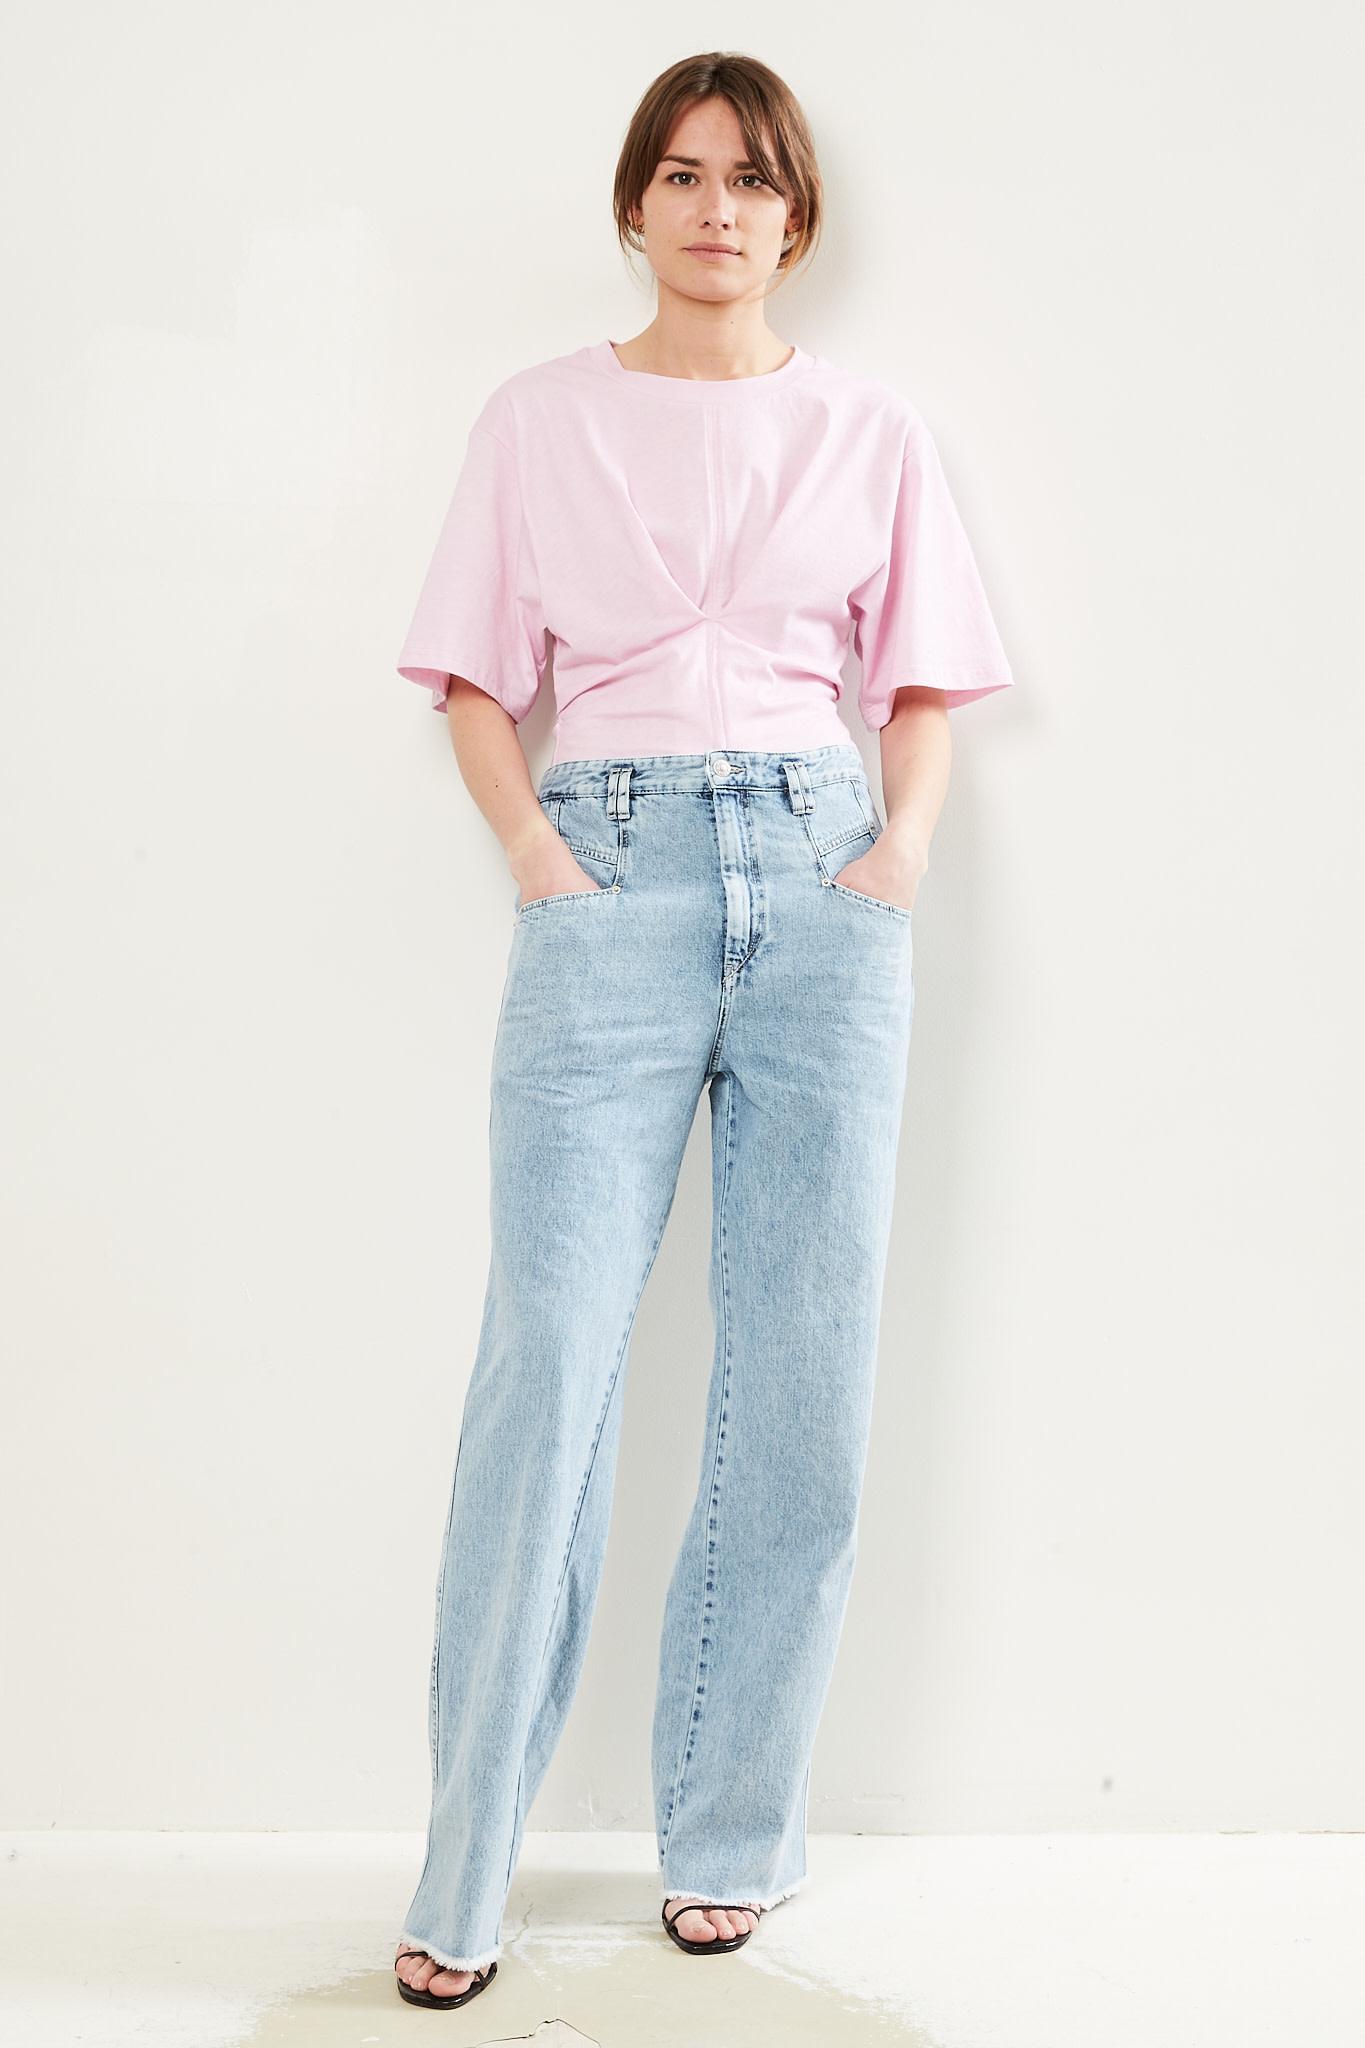 Isabel Marant - Soyona colored jersey t shirt